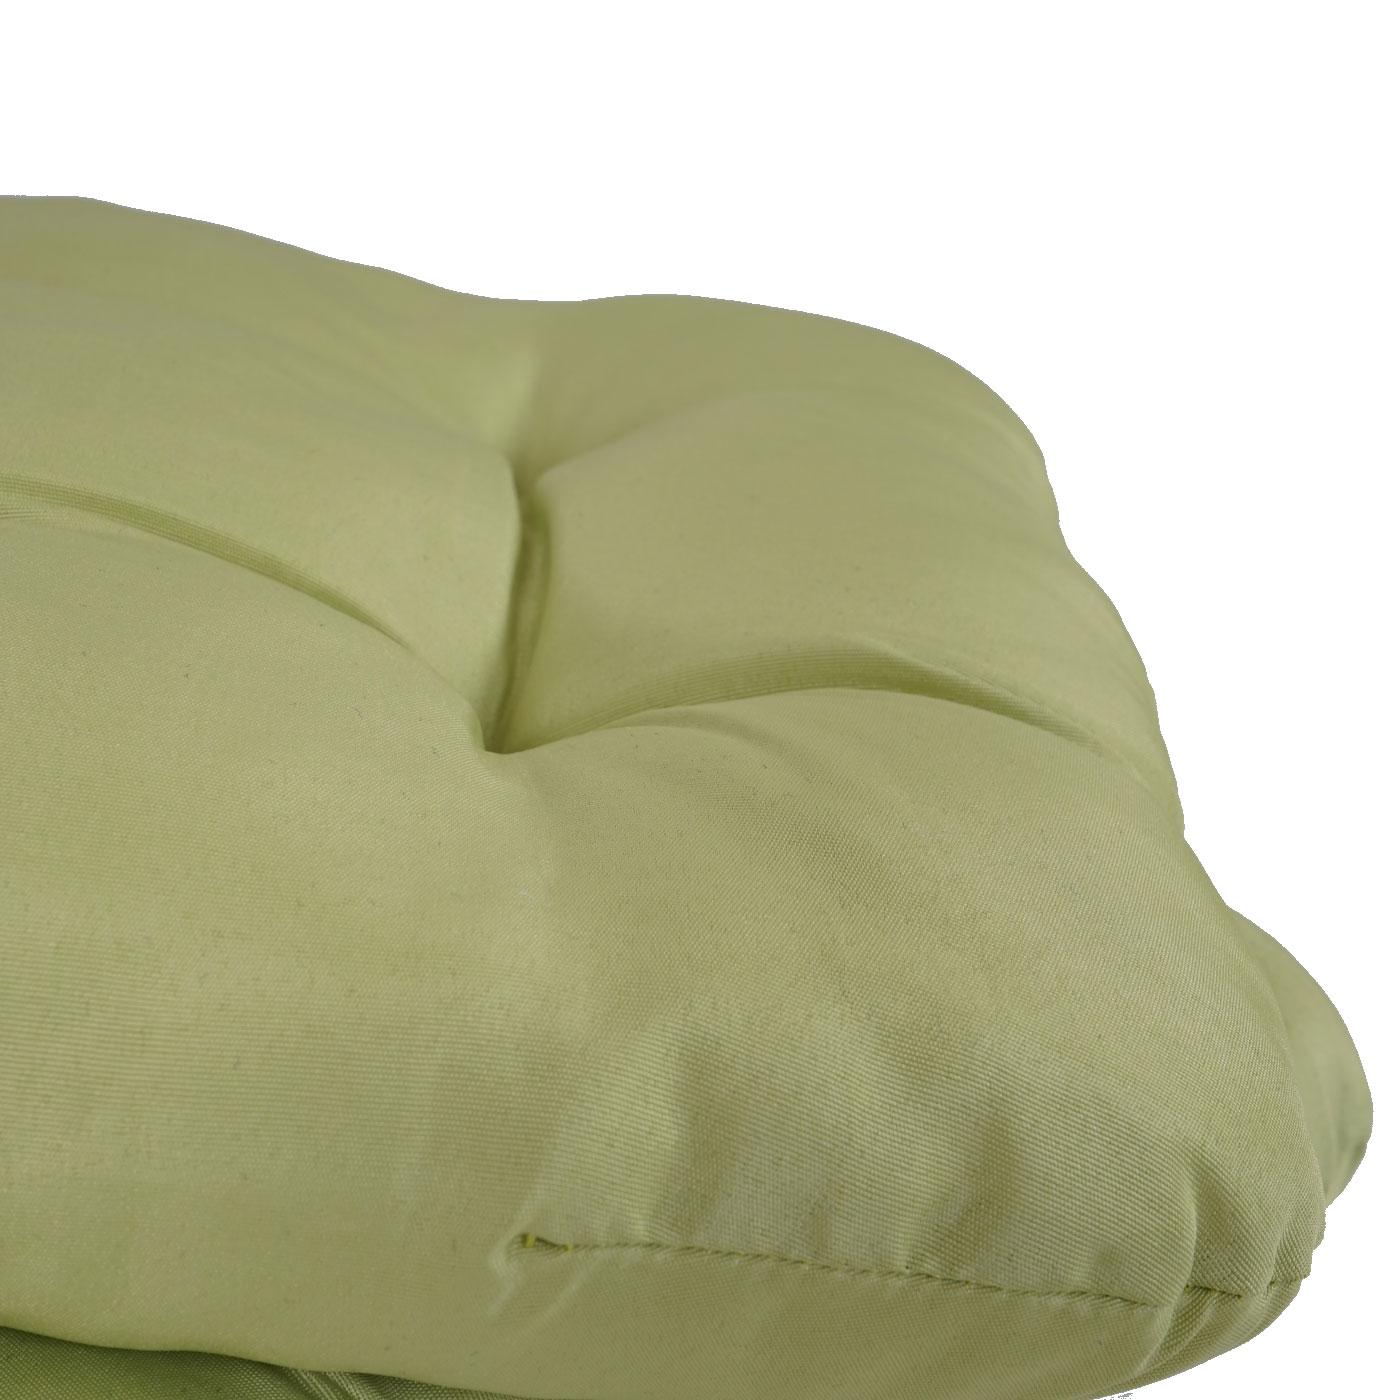 2x sitzkissen dublin stuhlkissen kissen 41x38x8cm. Black Bedroom Furniture Sets. Home Design Ideas